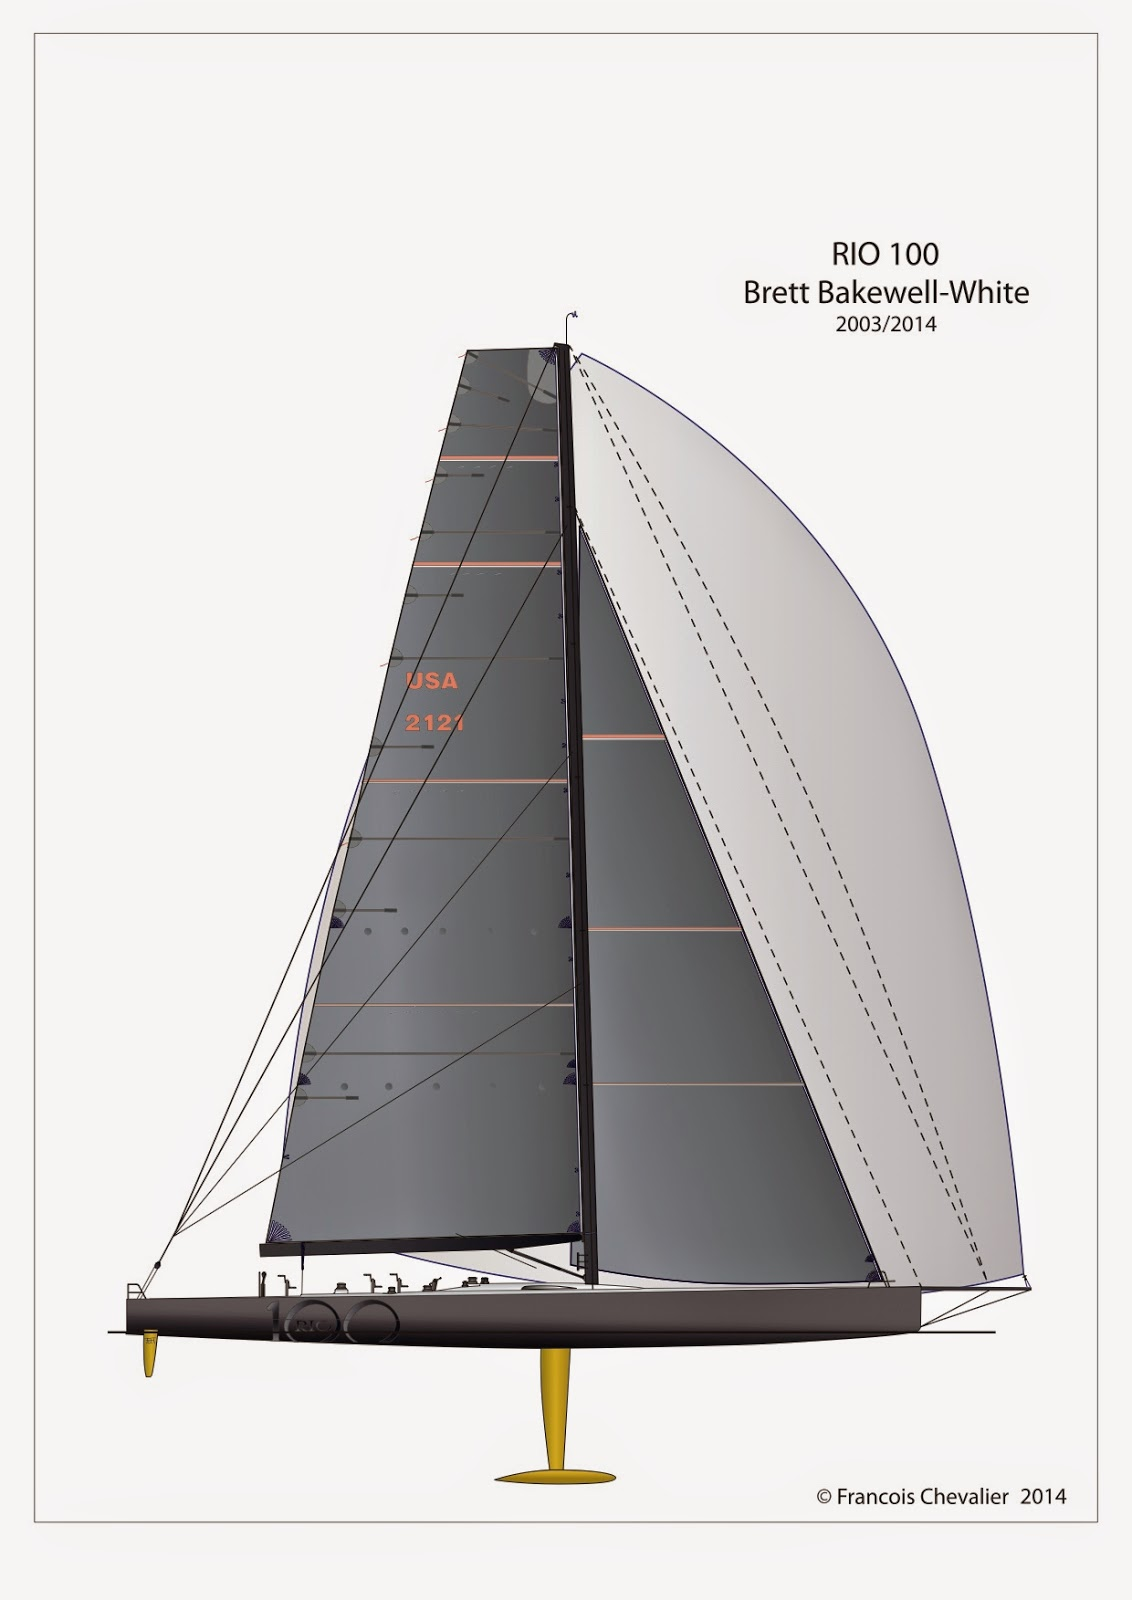 racing yacht diagram wiring diagram source rc boat diagram racing yacht diagram [ 1132 x 1600 Pixel ]